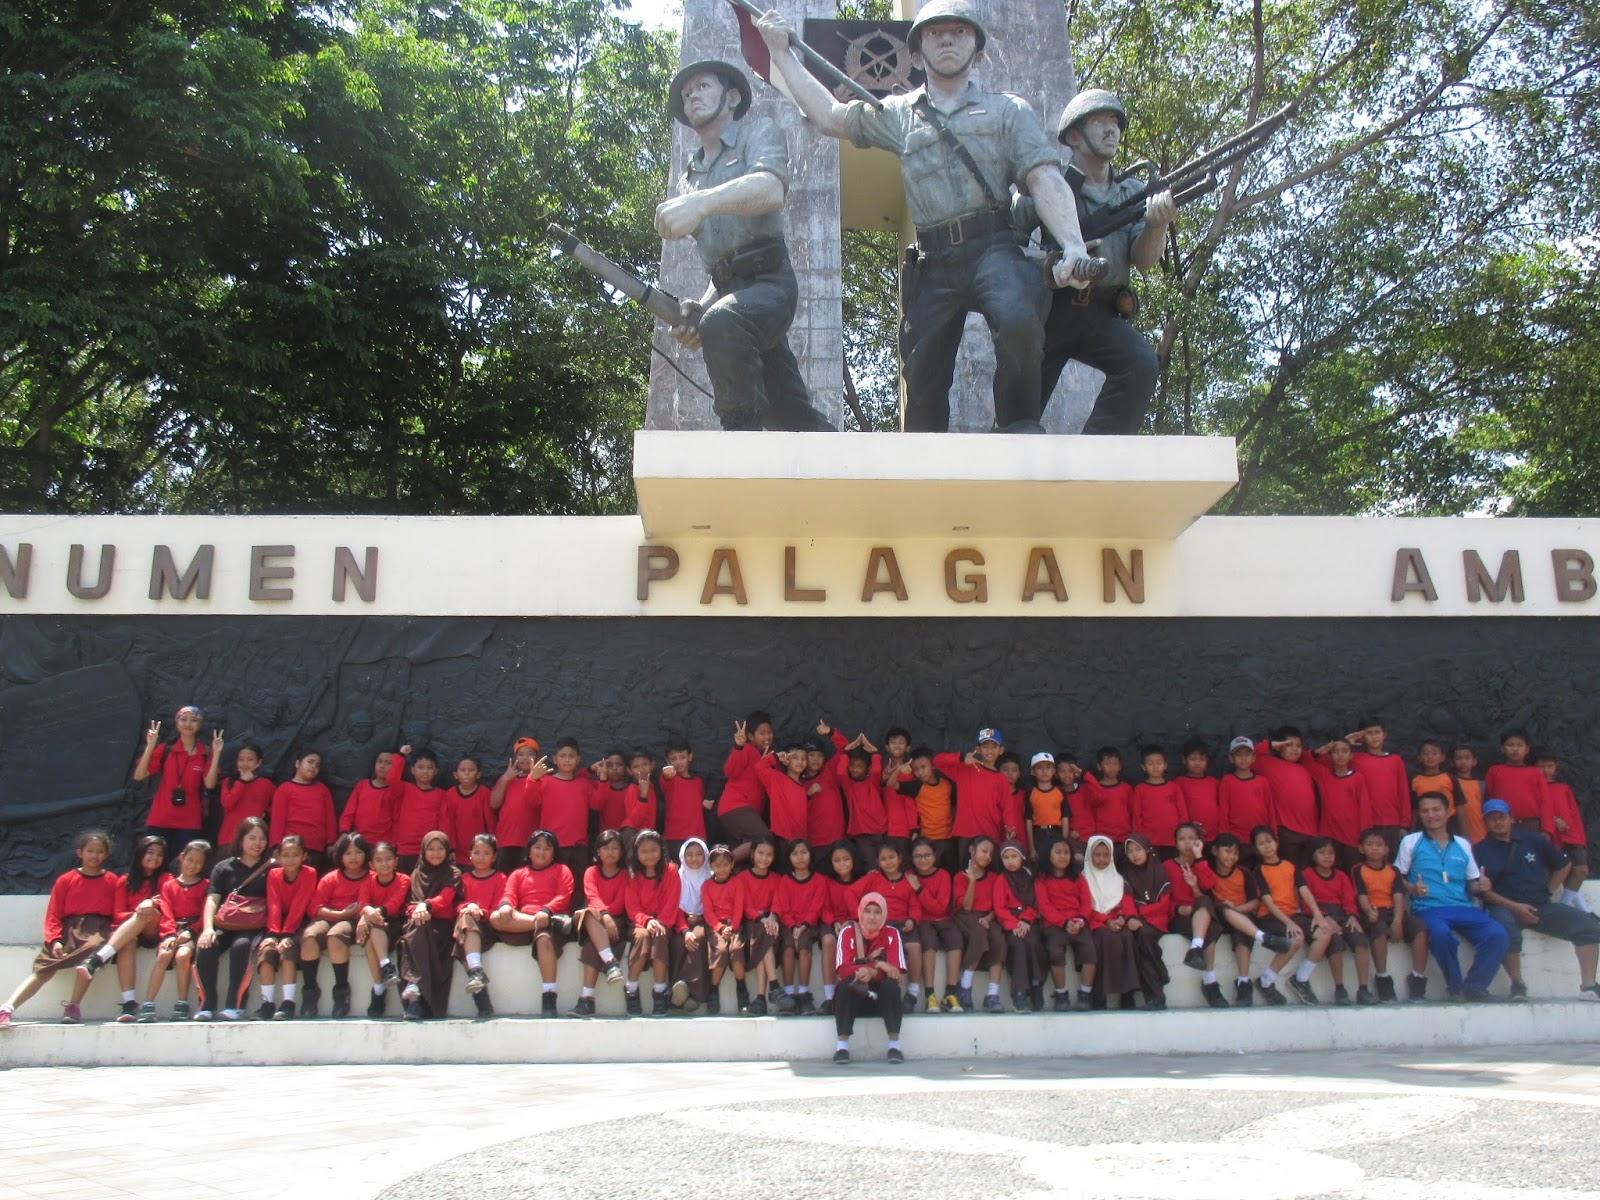 Blog Sasi Sugiharto Kunjungan Monumen Palagan Ambarawa Sd Lerep 06